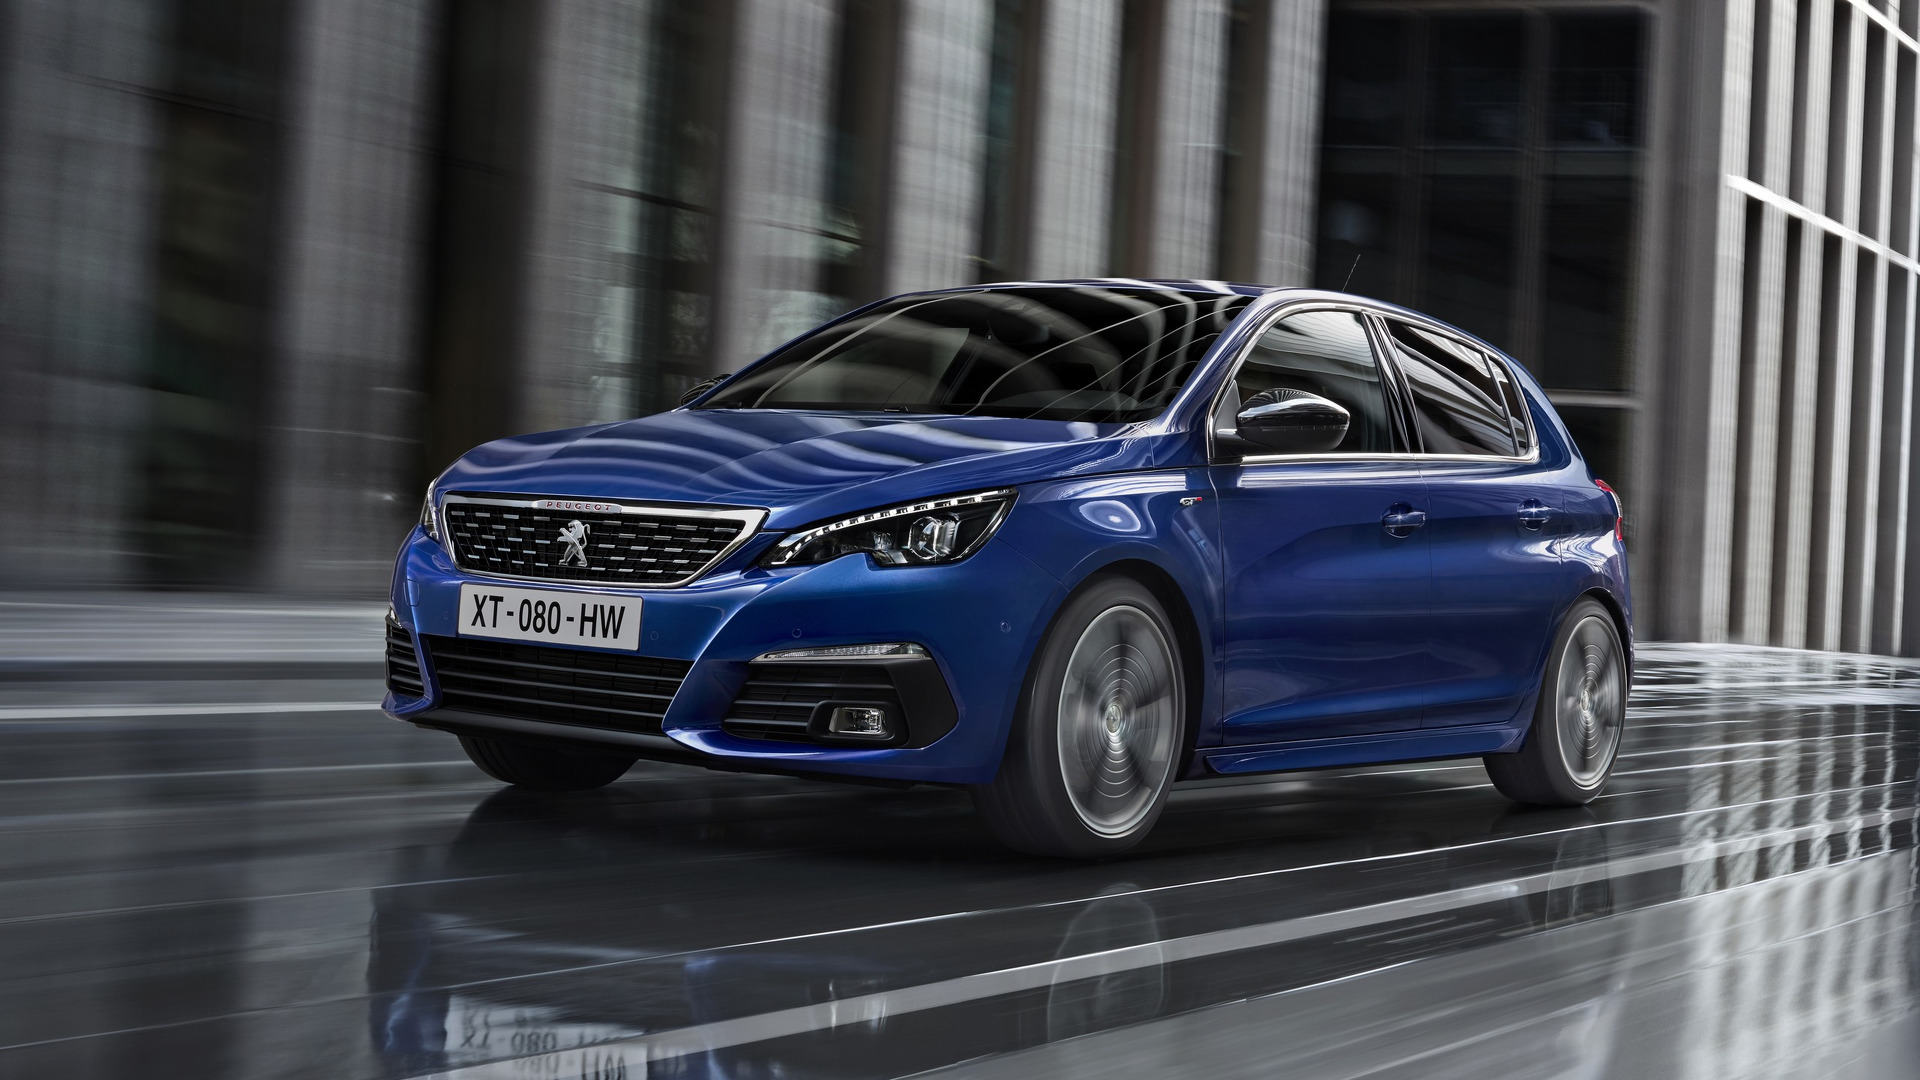 2018-peugeot-308-facelift (1)